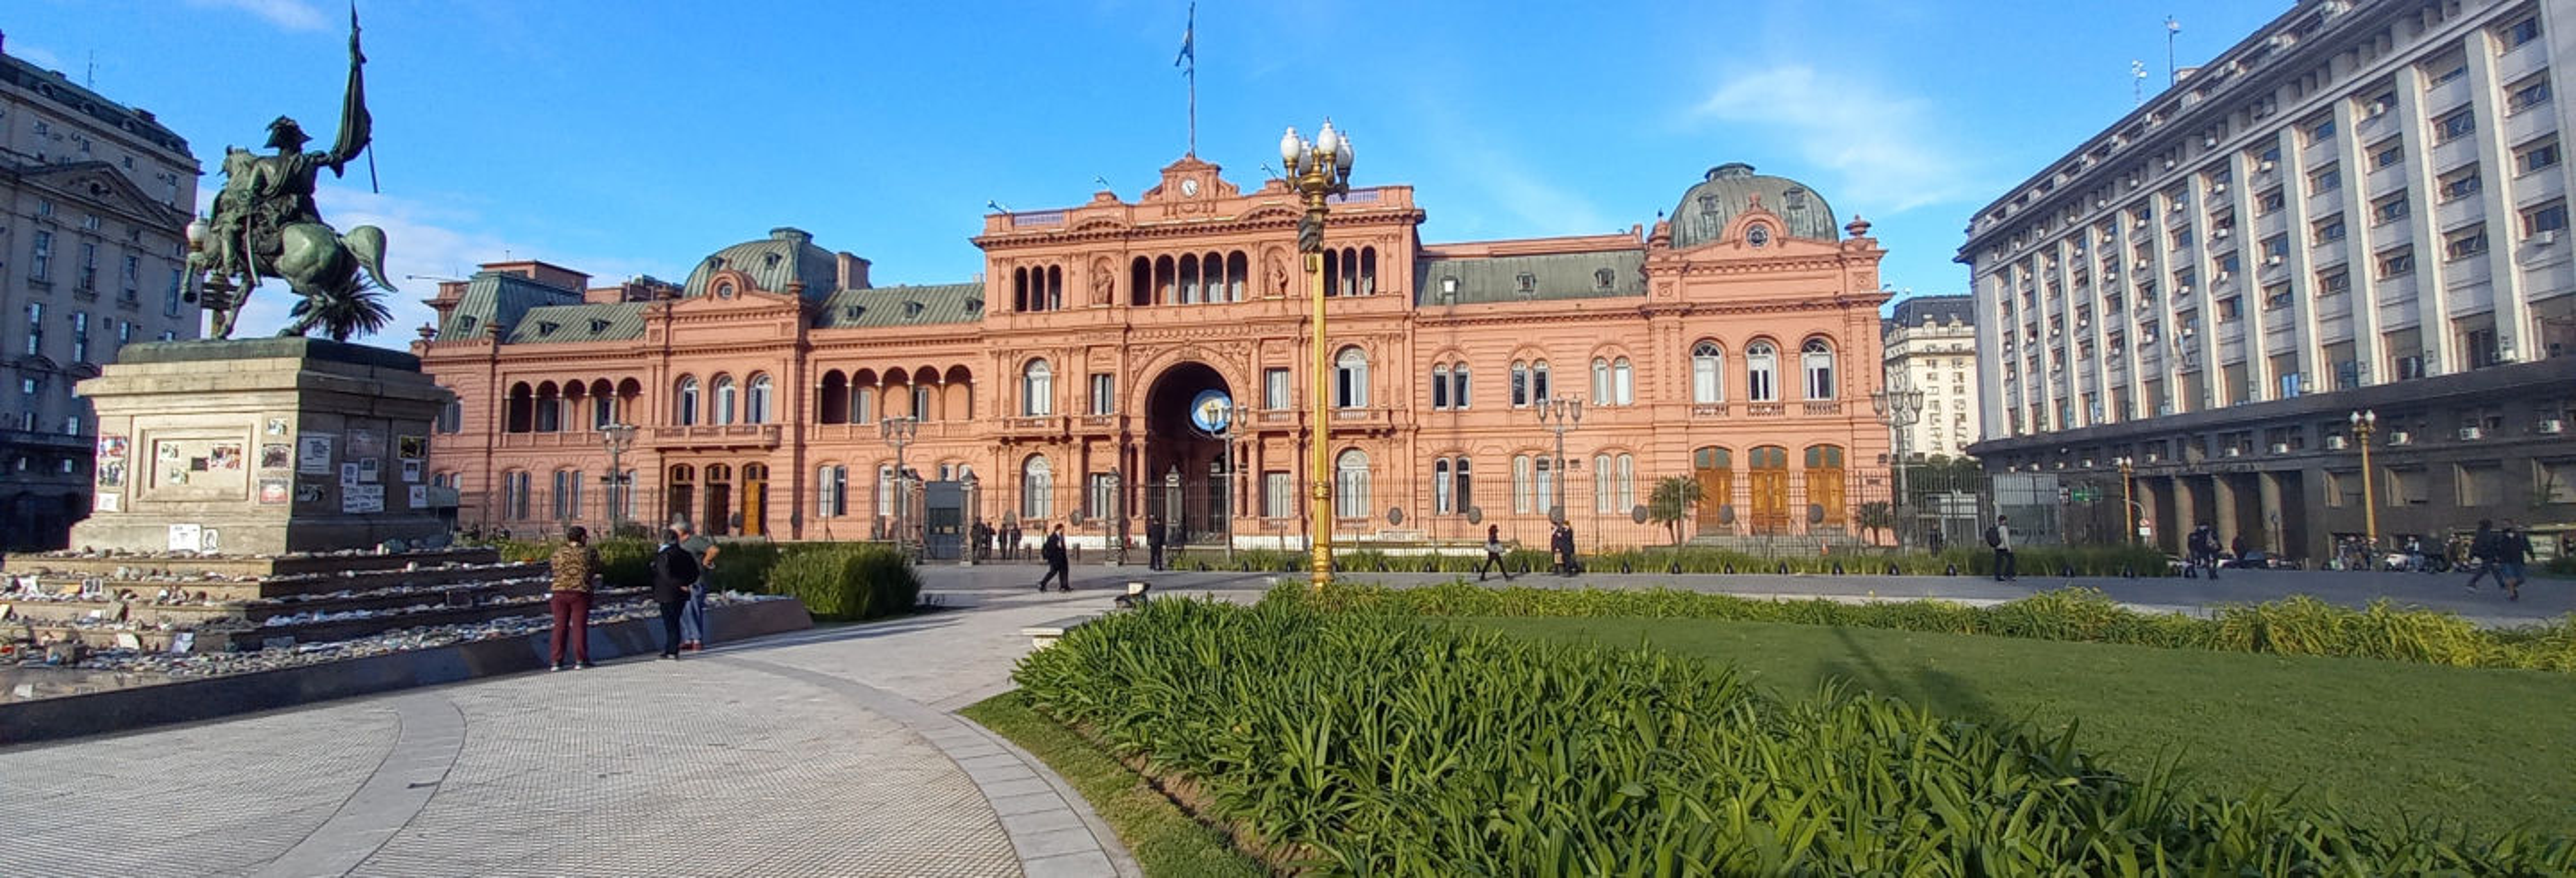 Tour por el Mercado de San Telmo